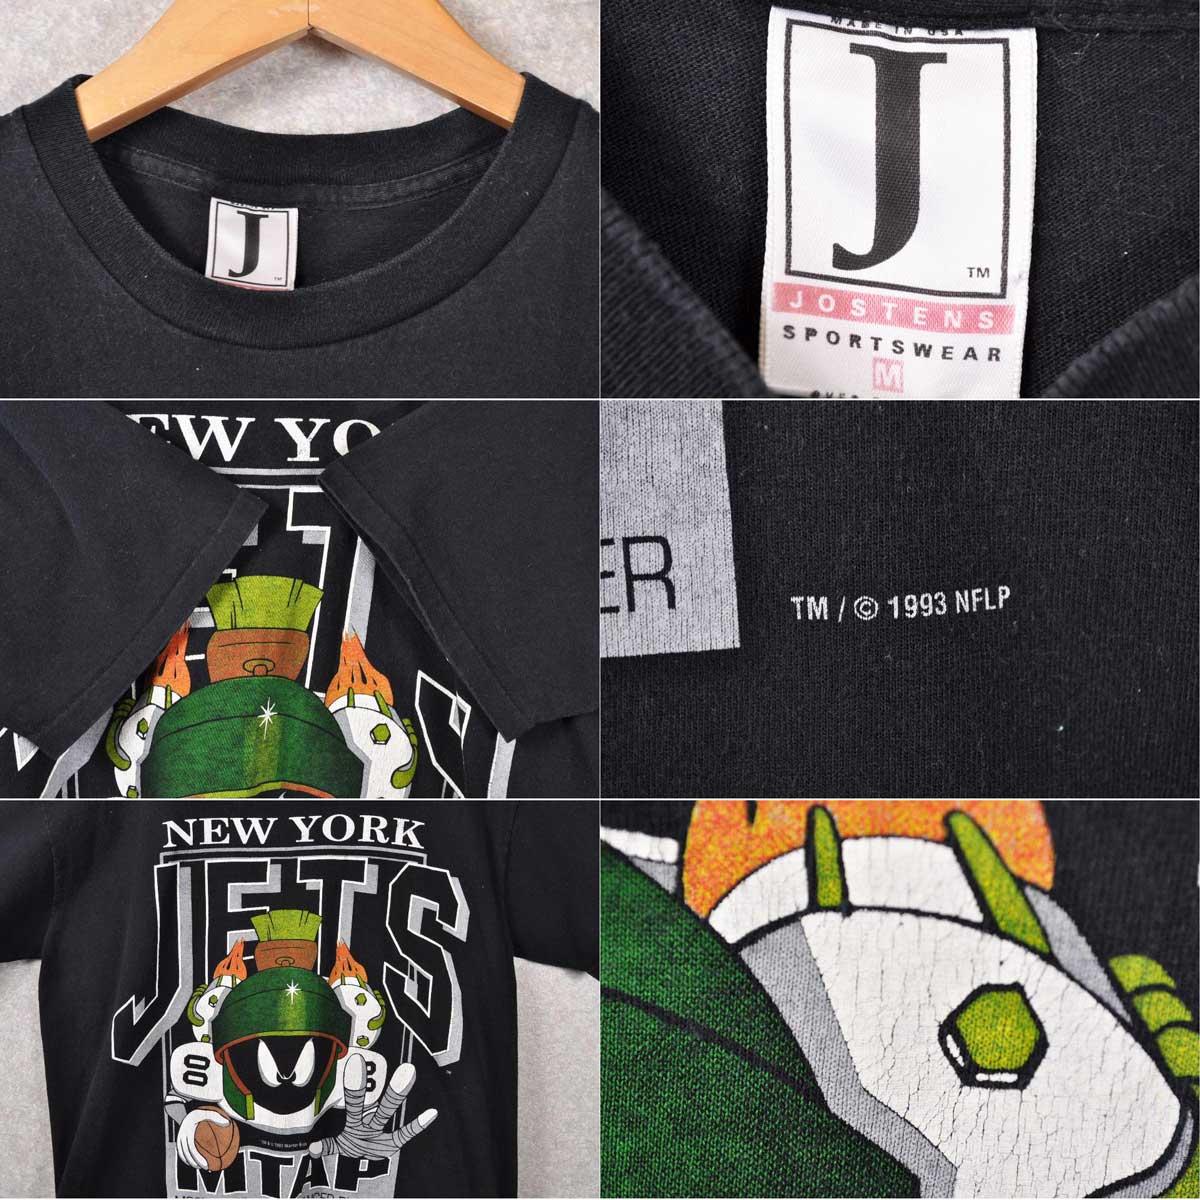 / Vintage 1993 USA-NFL NEWYORK JETS New York Jets / LOONEY TUNES Looney Tunes / Marvin-the Martian / short sleeve t-shirt black / men's